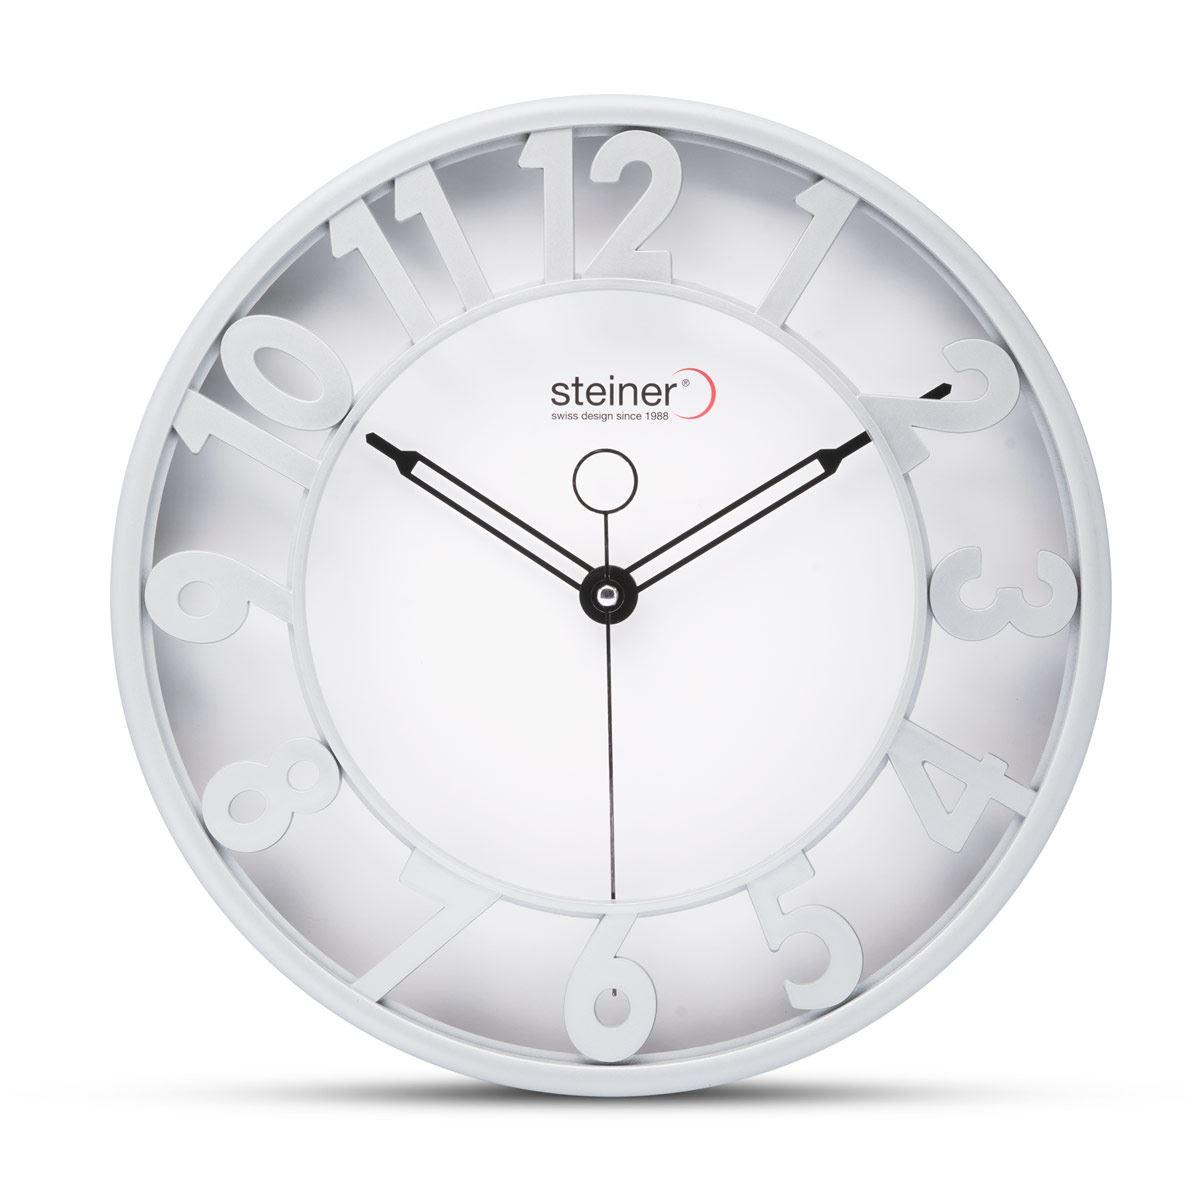 Reloj de Pared Steiner Blanco 3280-YZ